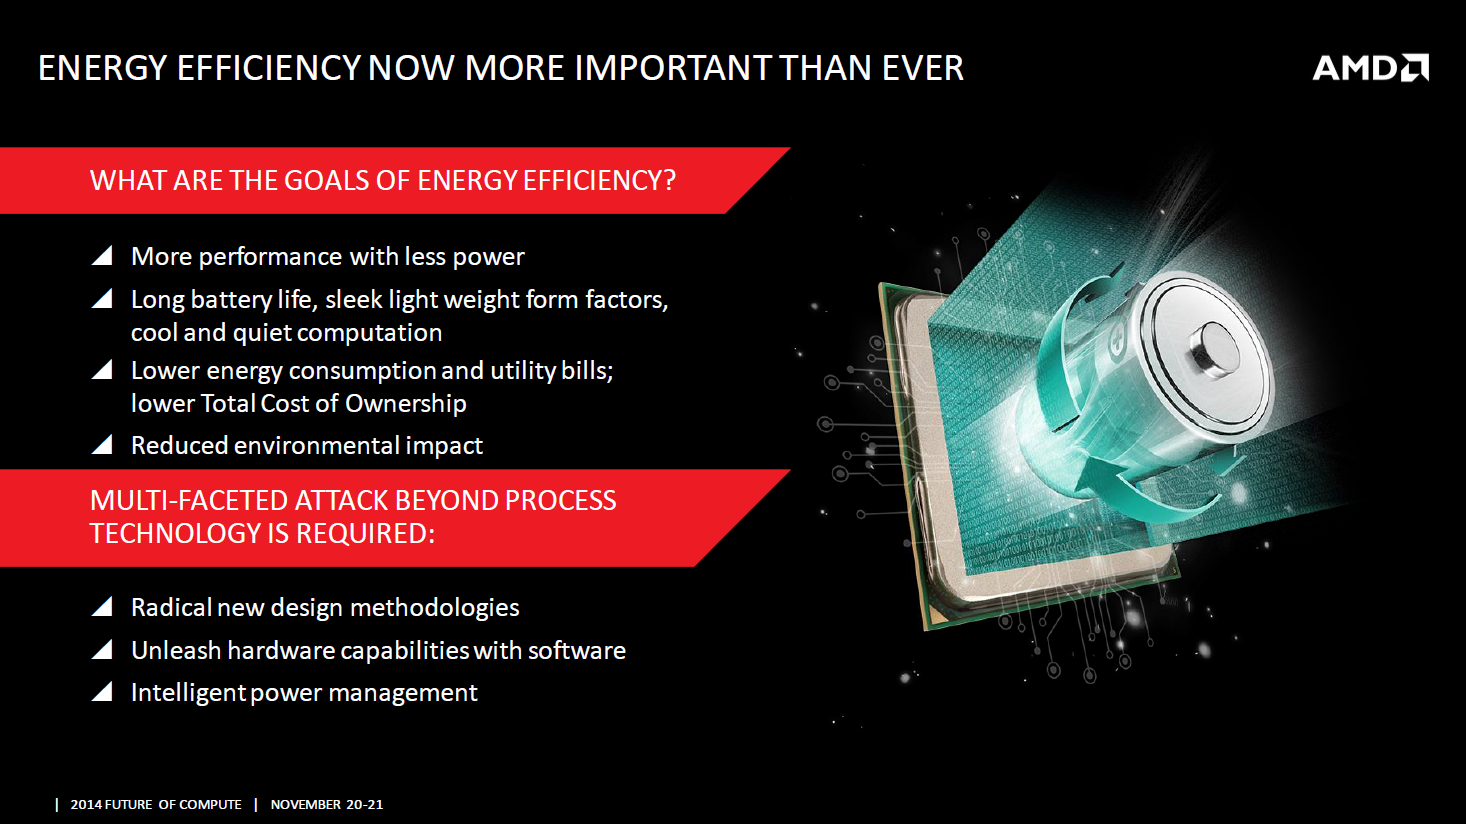 amd-energy-efficiency-future-of-compute